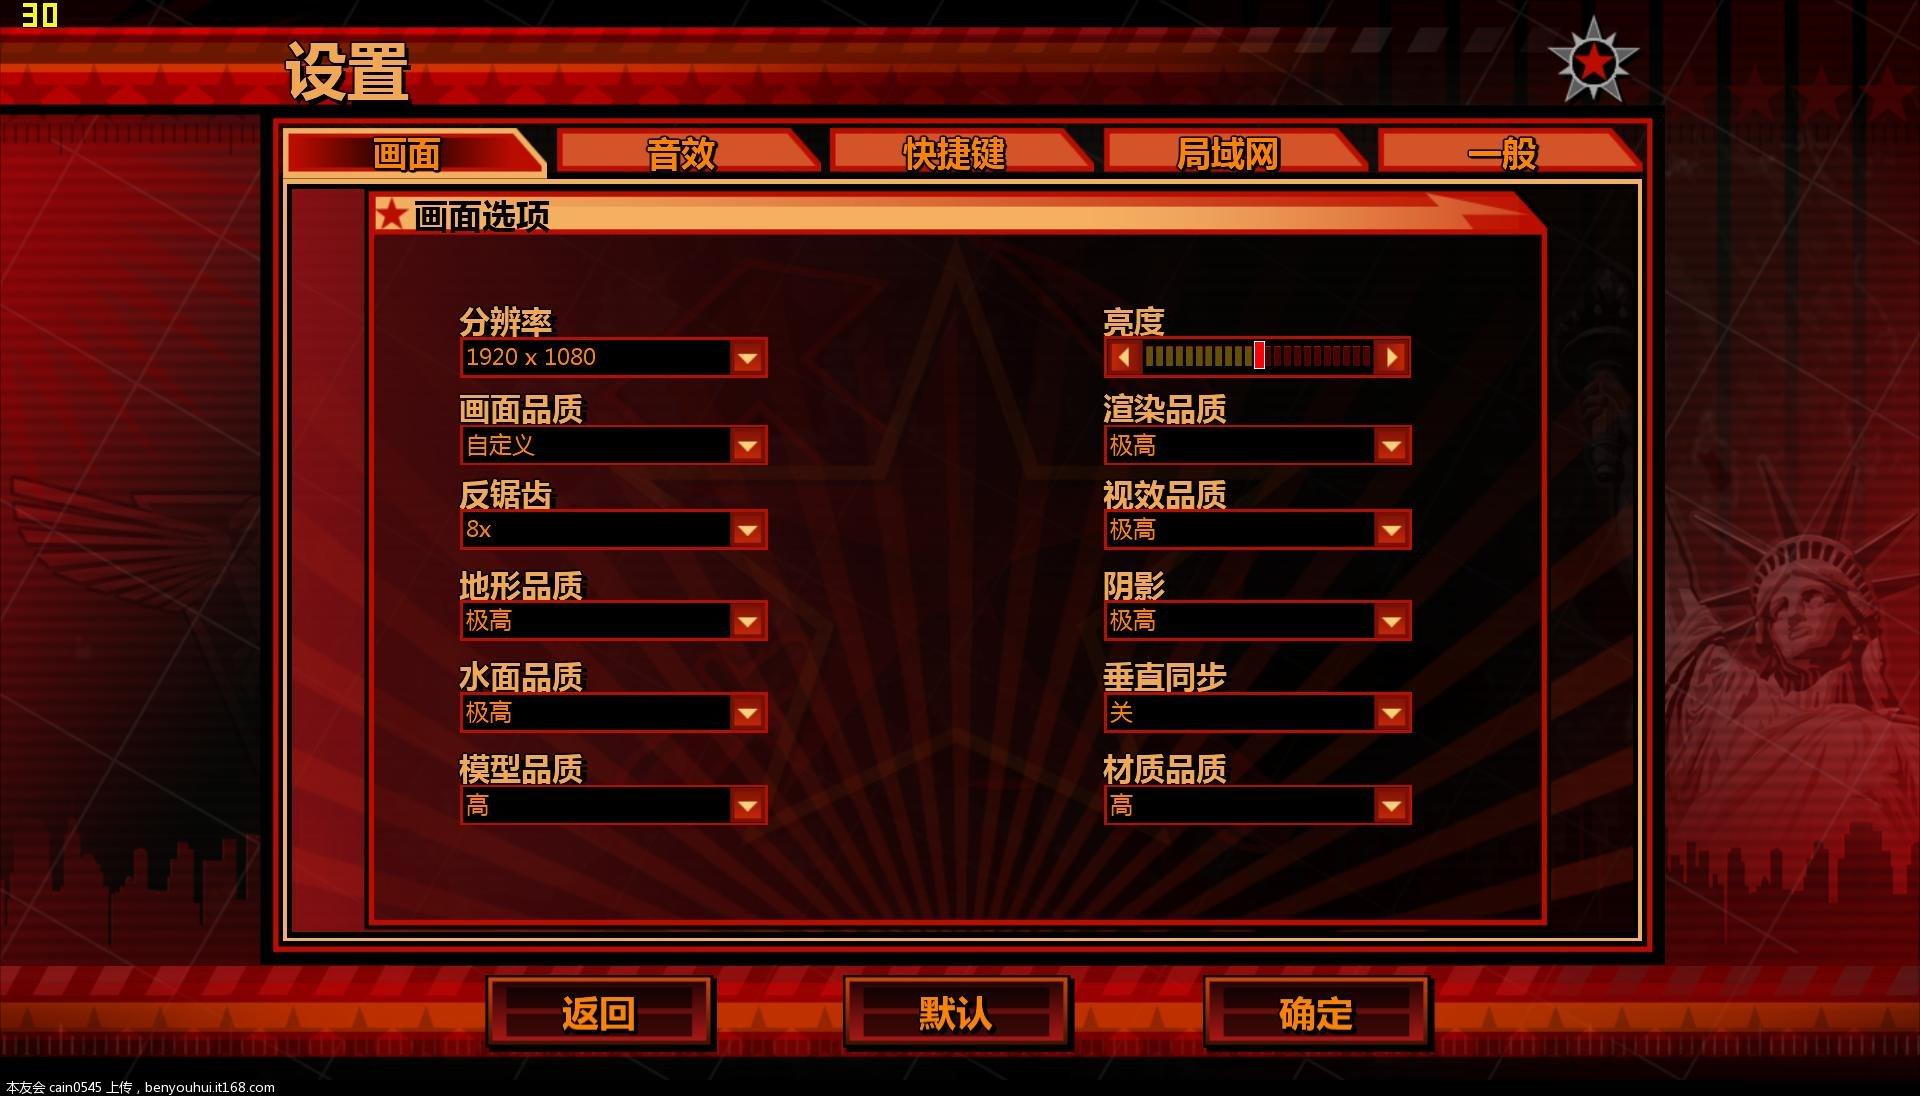 RA3_1 2012-10-08 06-03-24-81.jpg